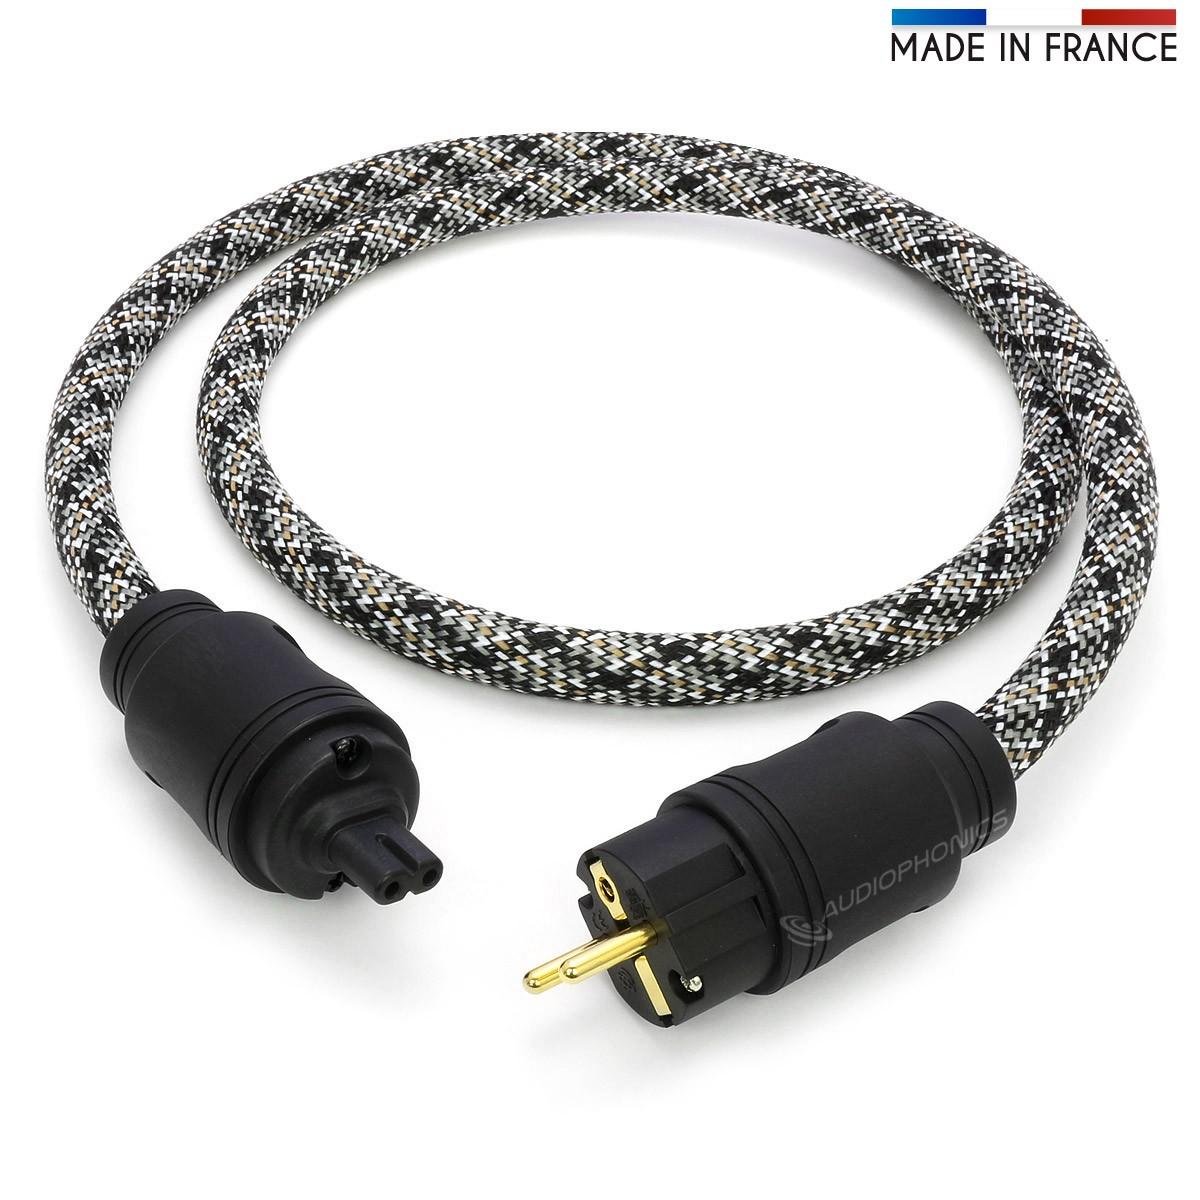 ELECAUDIO SILVER LINE MKII Câble Secteur OFC 3x3.5mm² C7 1.5m